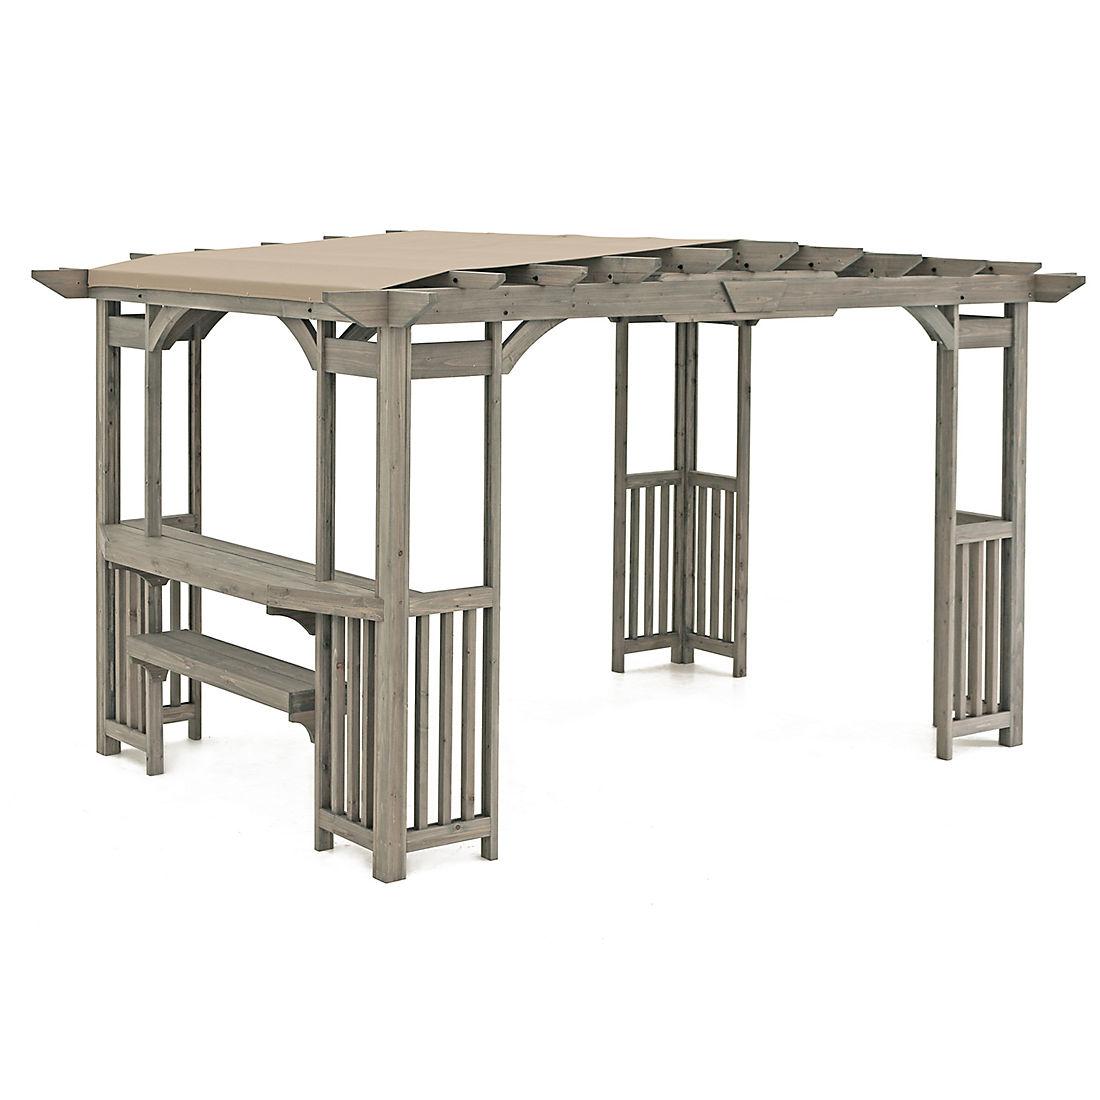 Swell Yardistry Madison 14 X 10 Pergola With Bar And Sunshade Machost Co Dining Chair Design Ideas Machostcouk